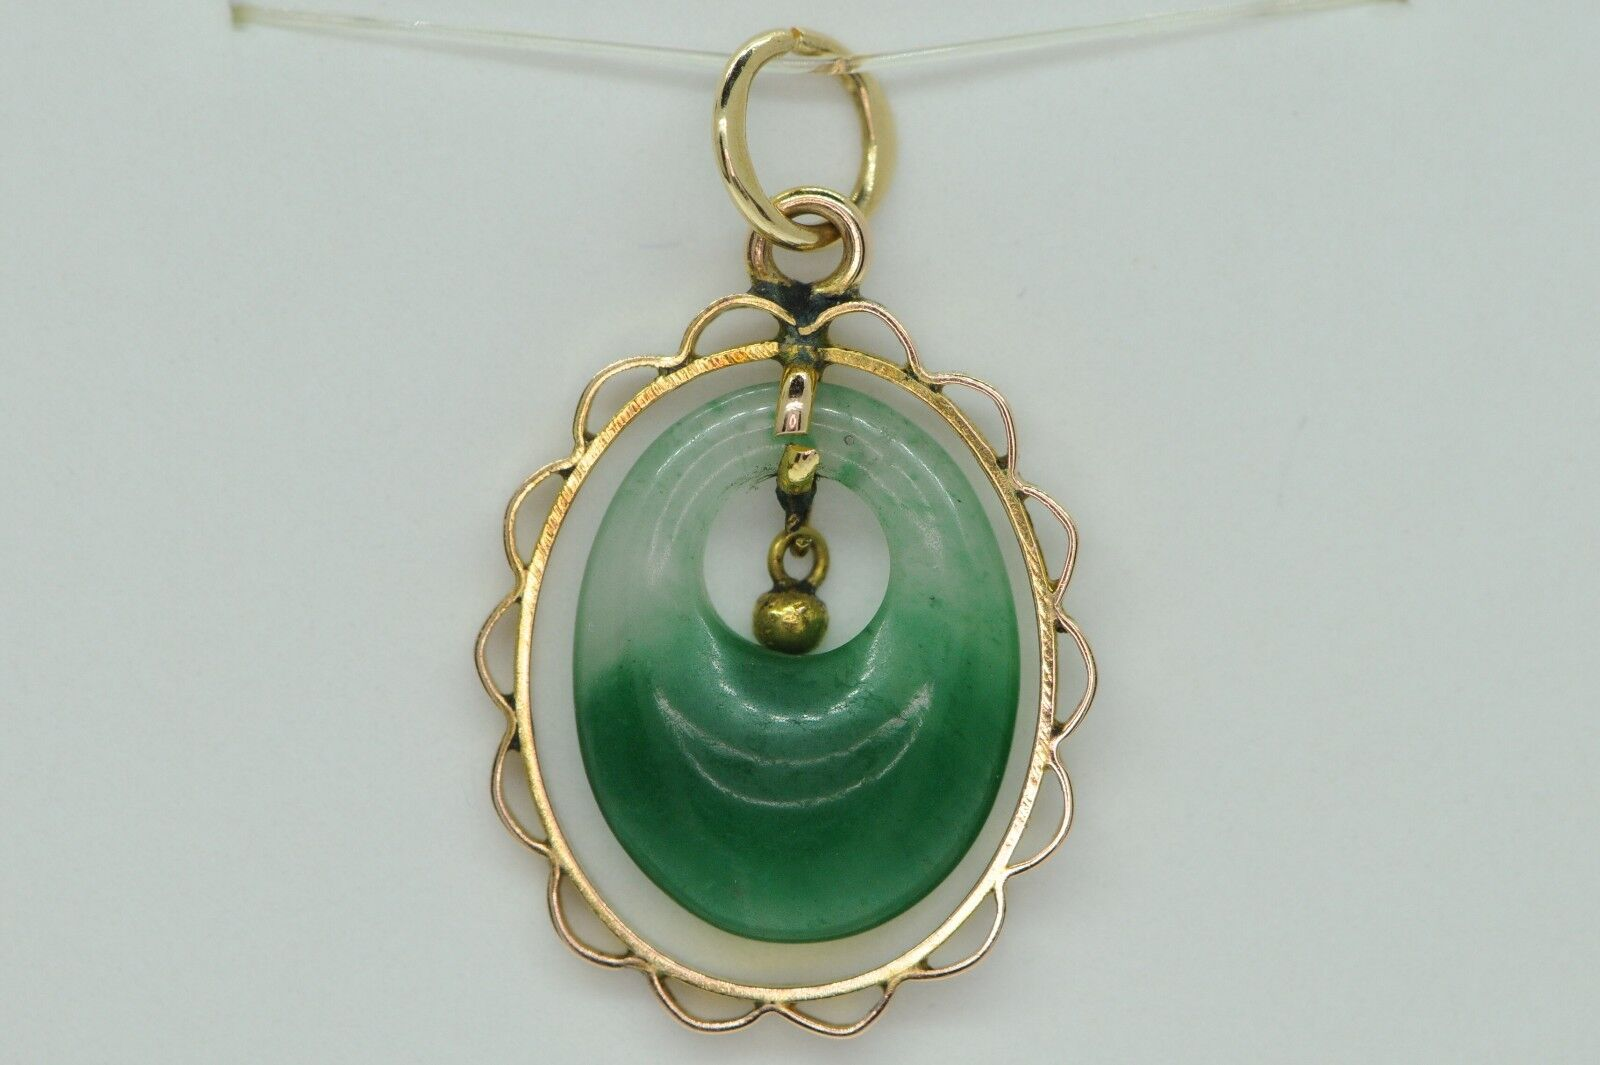 Art Deco Style (ca. 1935) 14K Yellow gold Jade Pendant